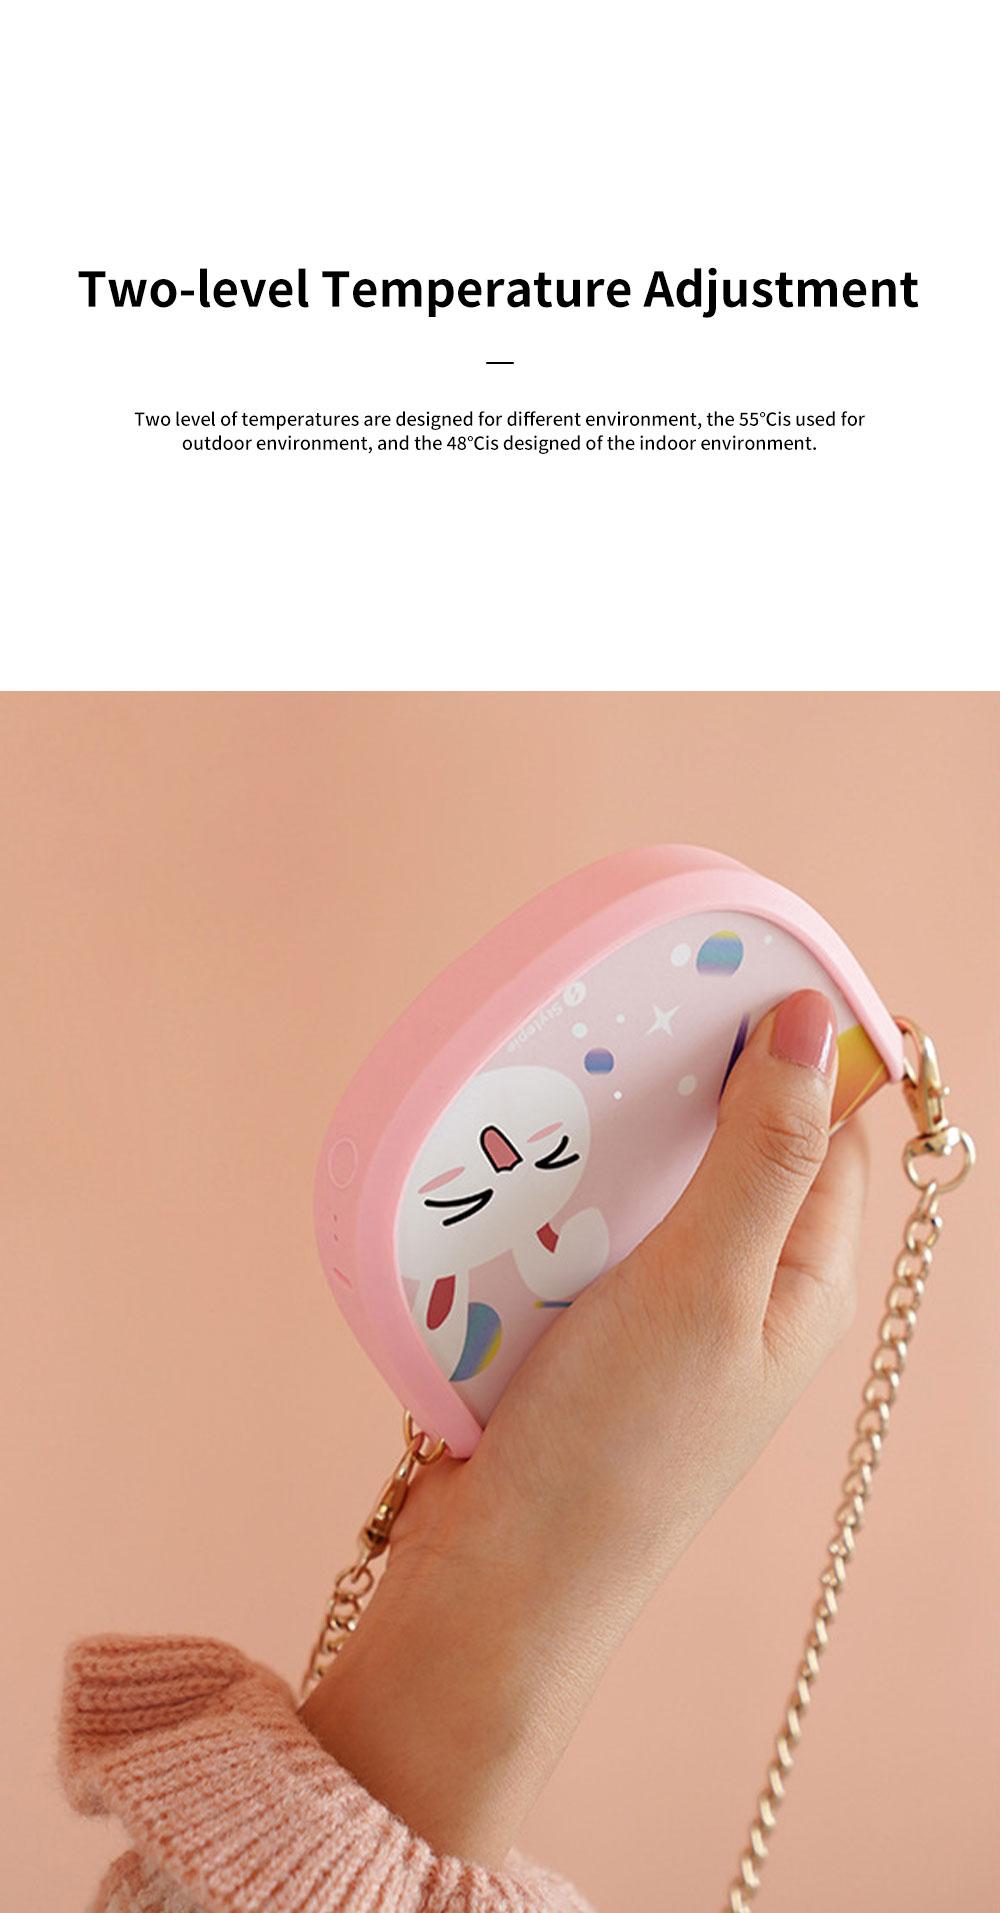 Portable Handbag Hand Warmer Unique Shoulder Bag-shaped Hands Warm Elf with 5000mAh Battery and USB Port for Phone Charging 2